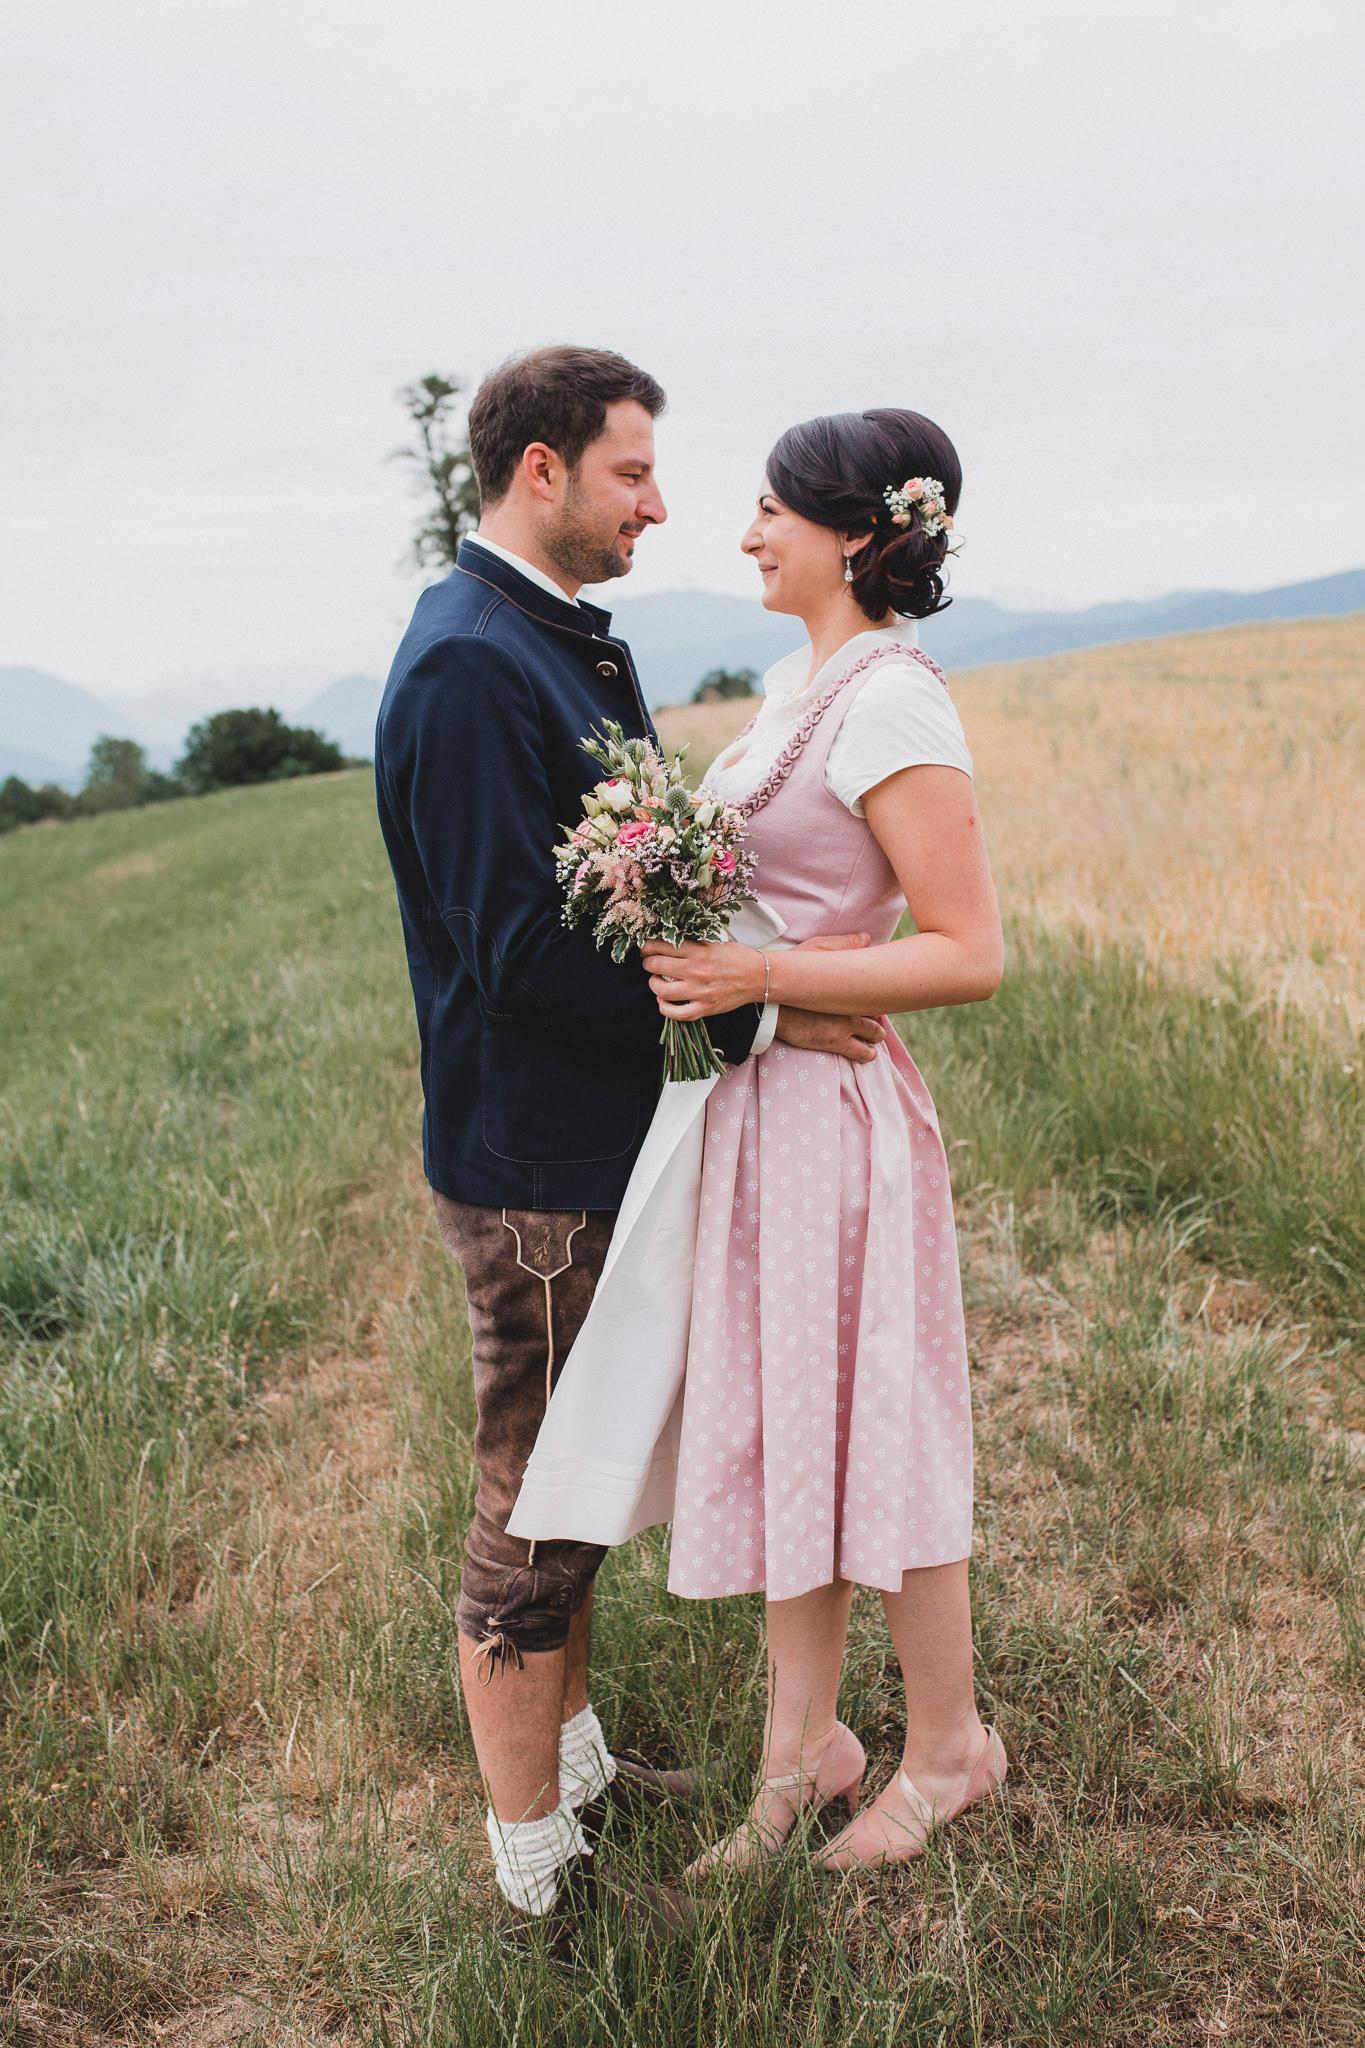 Brautpaar Feld Tracht Hochzeit